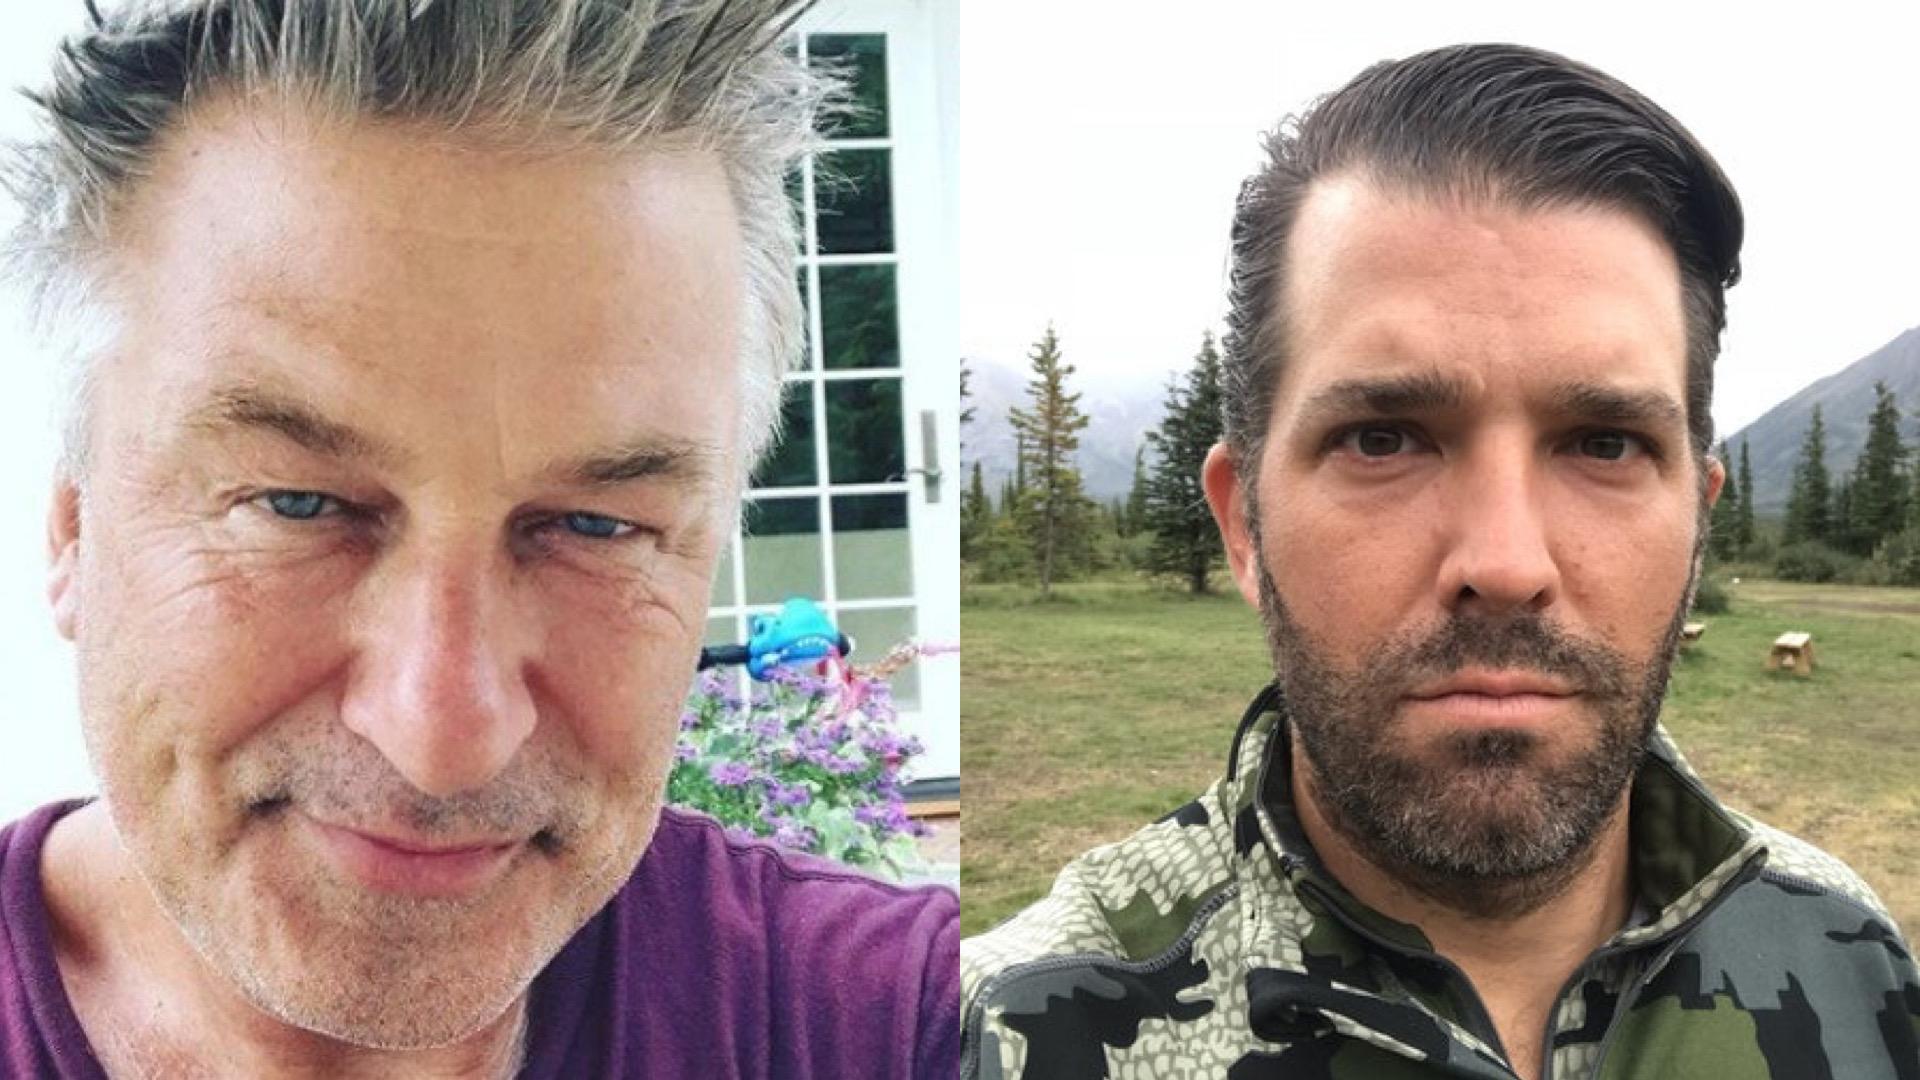 Donald Trump Jr. Makes T-Shirt Mocking Death of the 'Rust' Cinematographer Fatally Shot on Set: 'Guns Don't Kill People, Alex Baldwin Kills People'